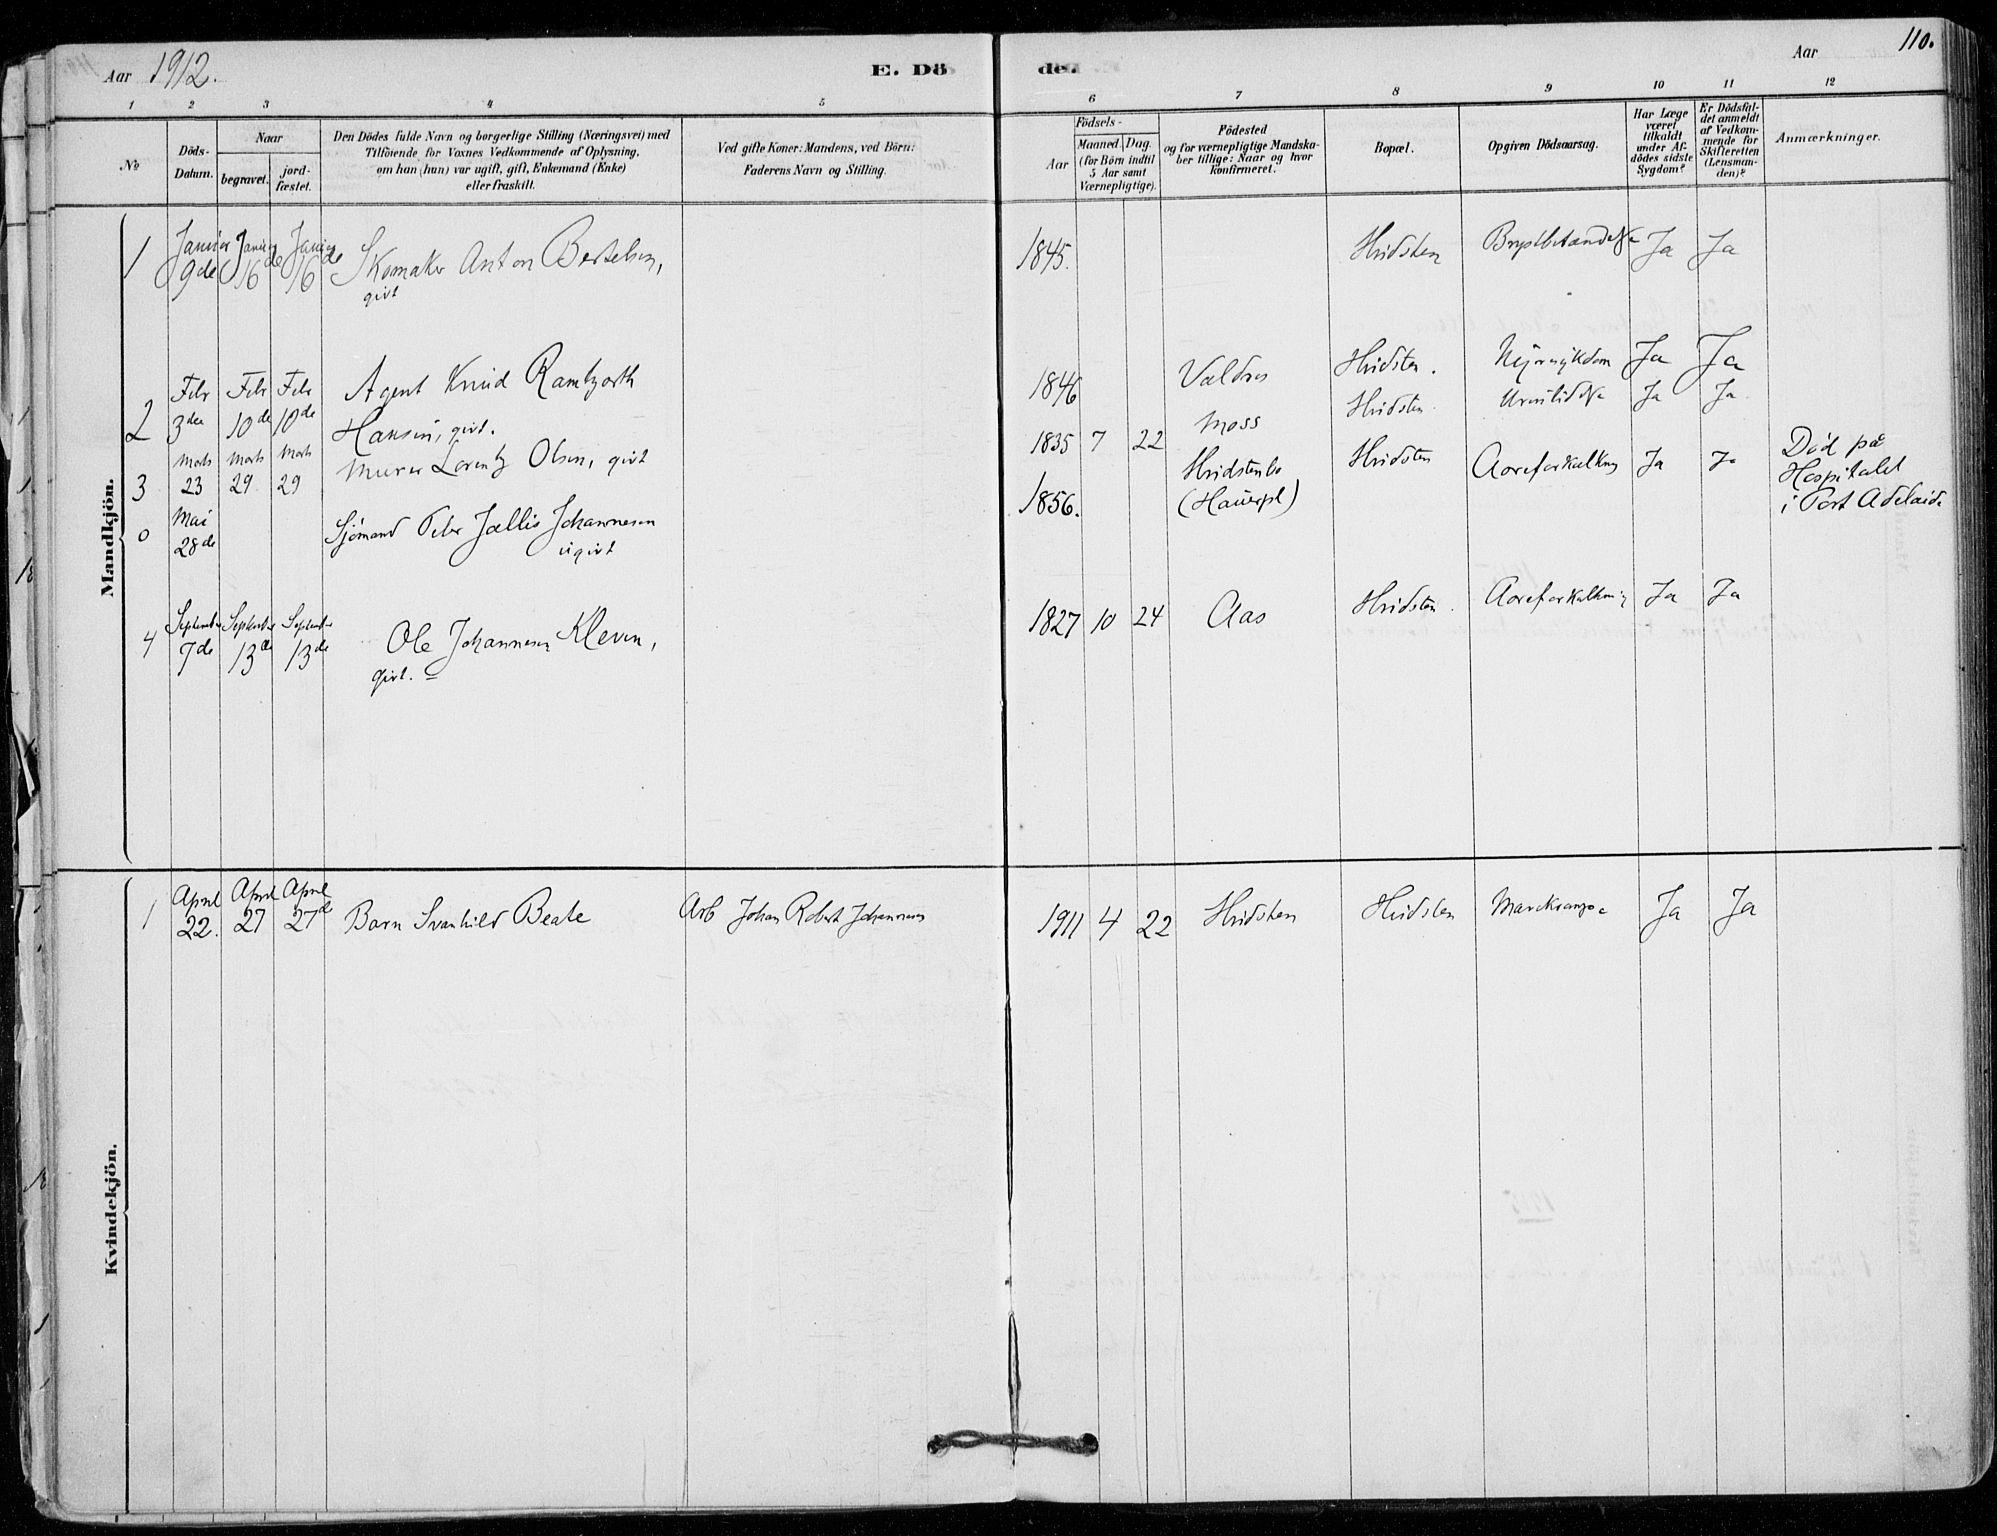 SAO, Vestby prestekontor Kirkebøker, F/Fd/L0001: Parish register (official) no. IV 1, 1878-1945, p. 110